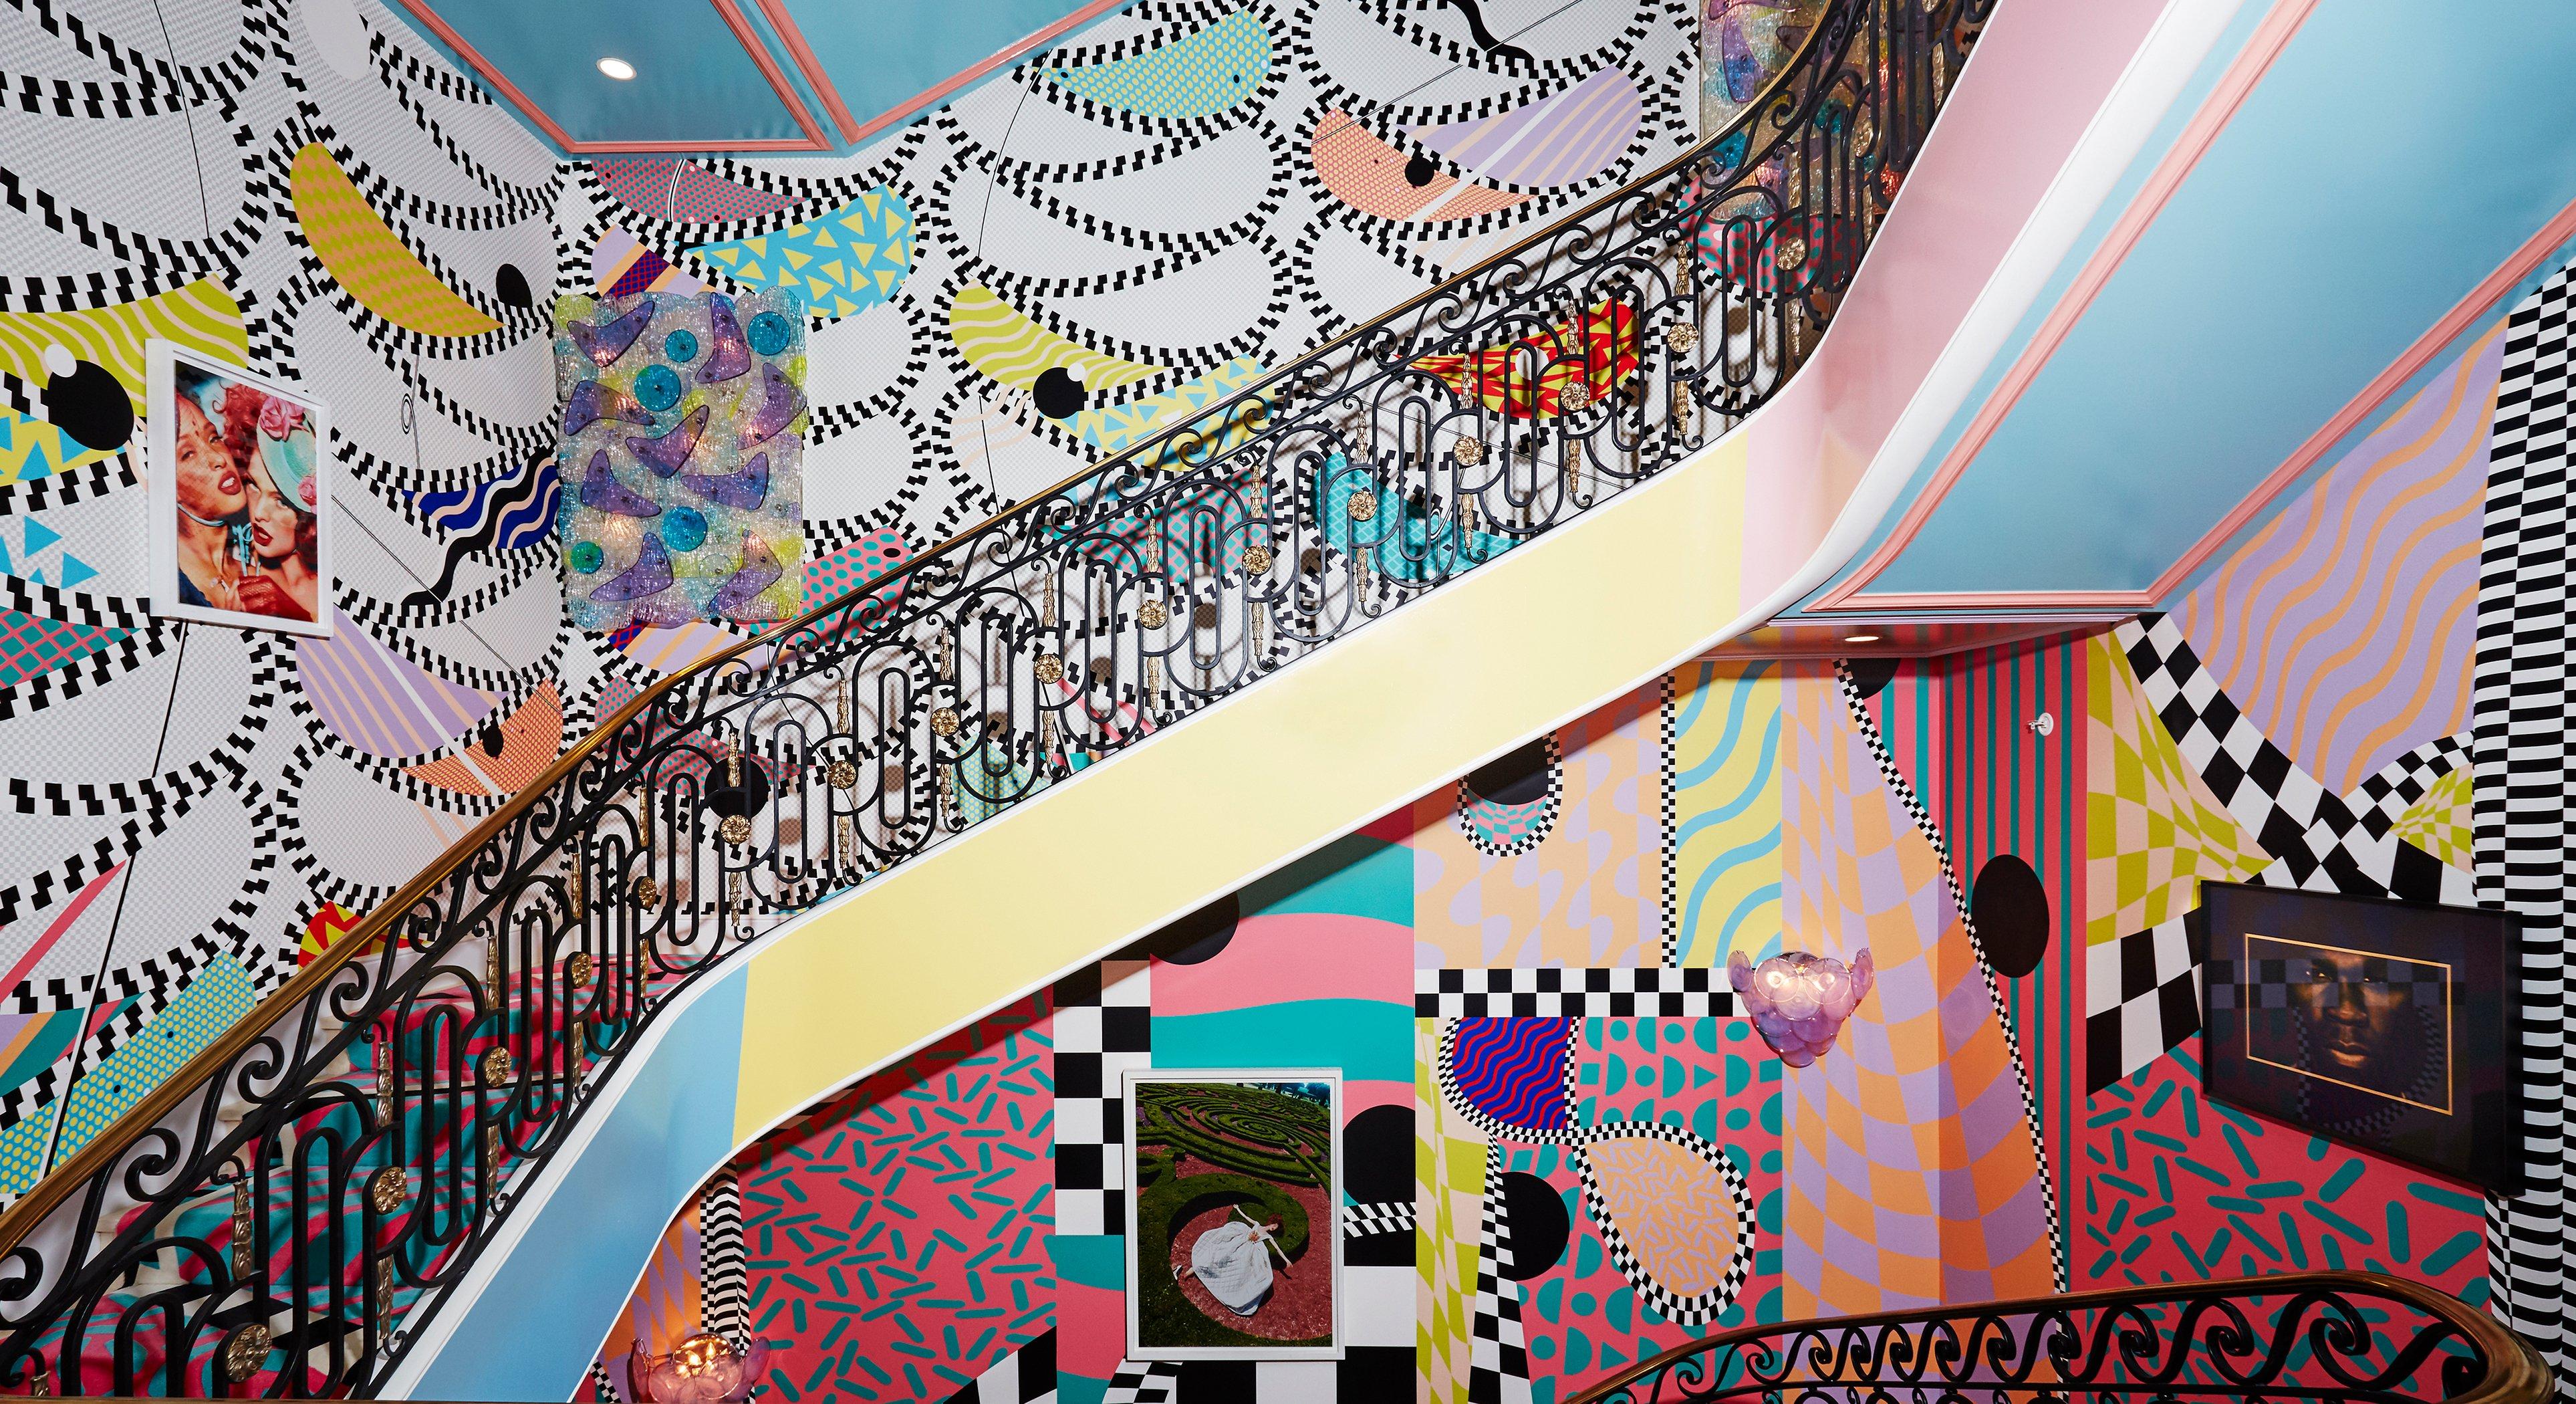 Voutsa Image 1_Stairway to Heaven Borderline Candy Ribbon Horizontal